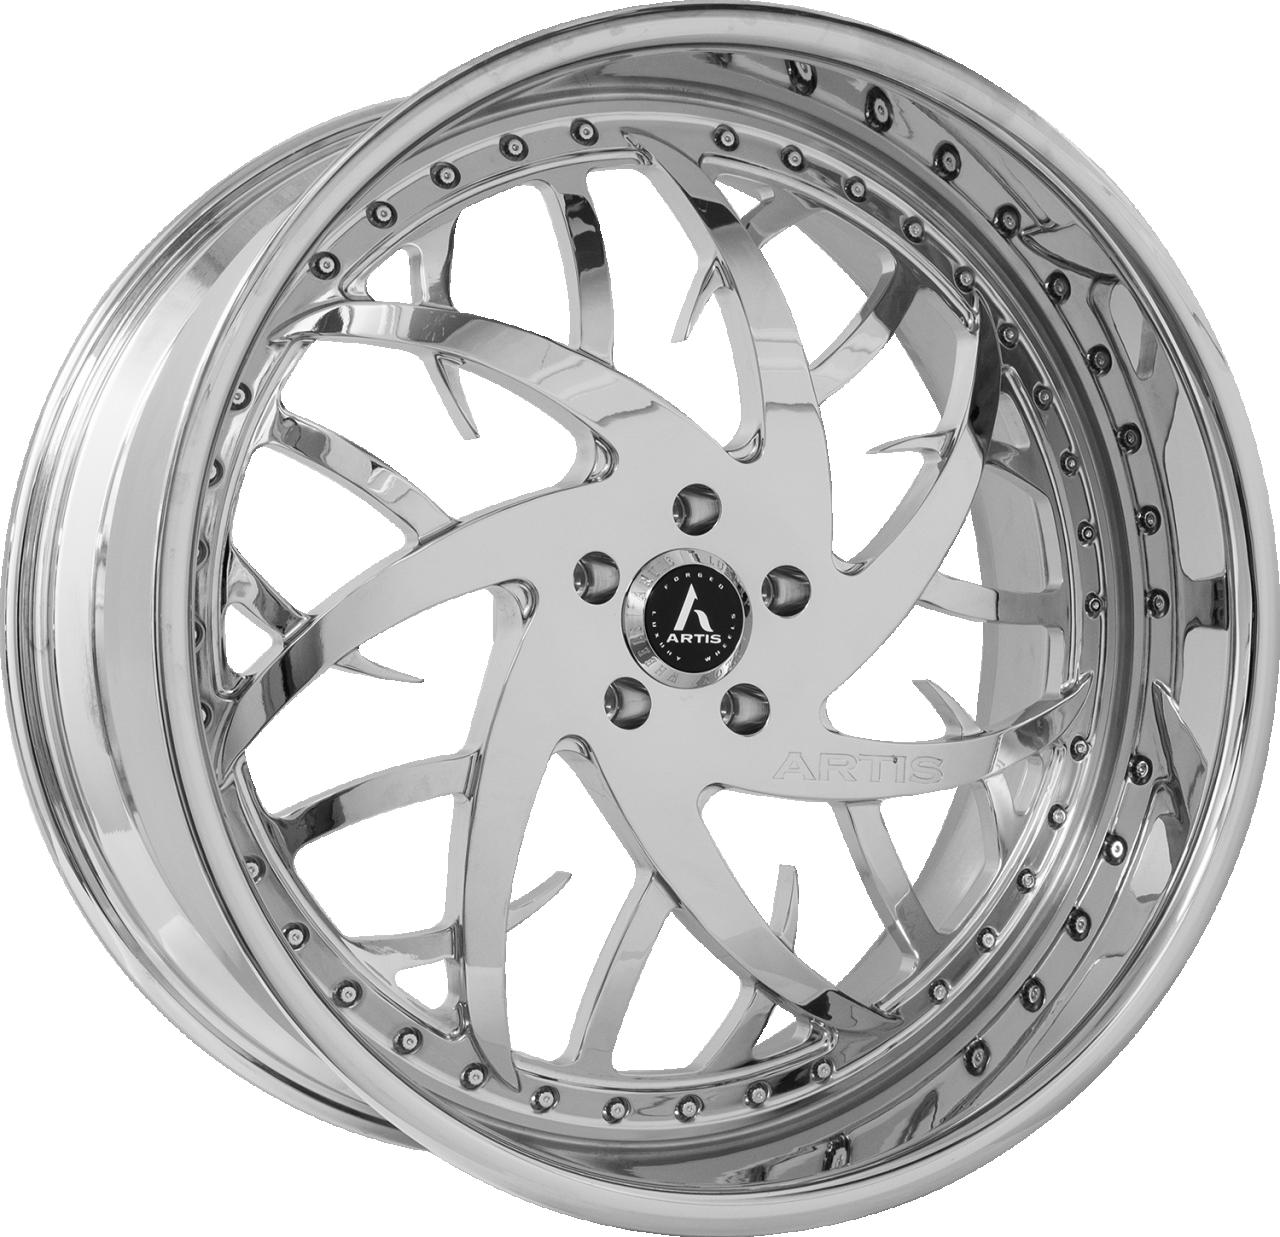 Artis Forged Harlem wheel with Full Chrome finish